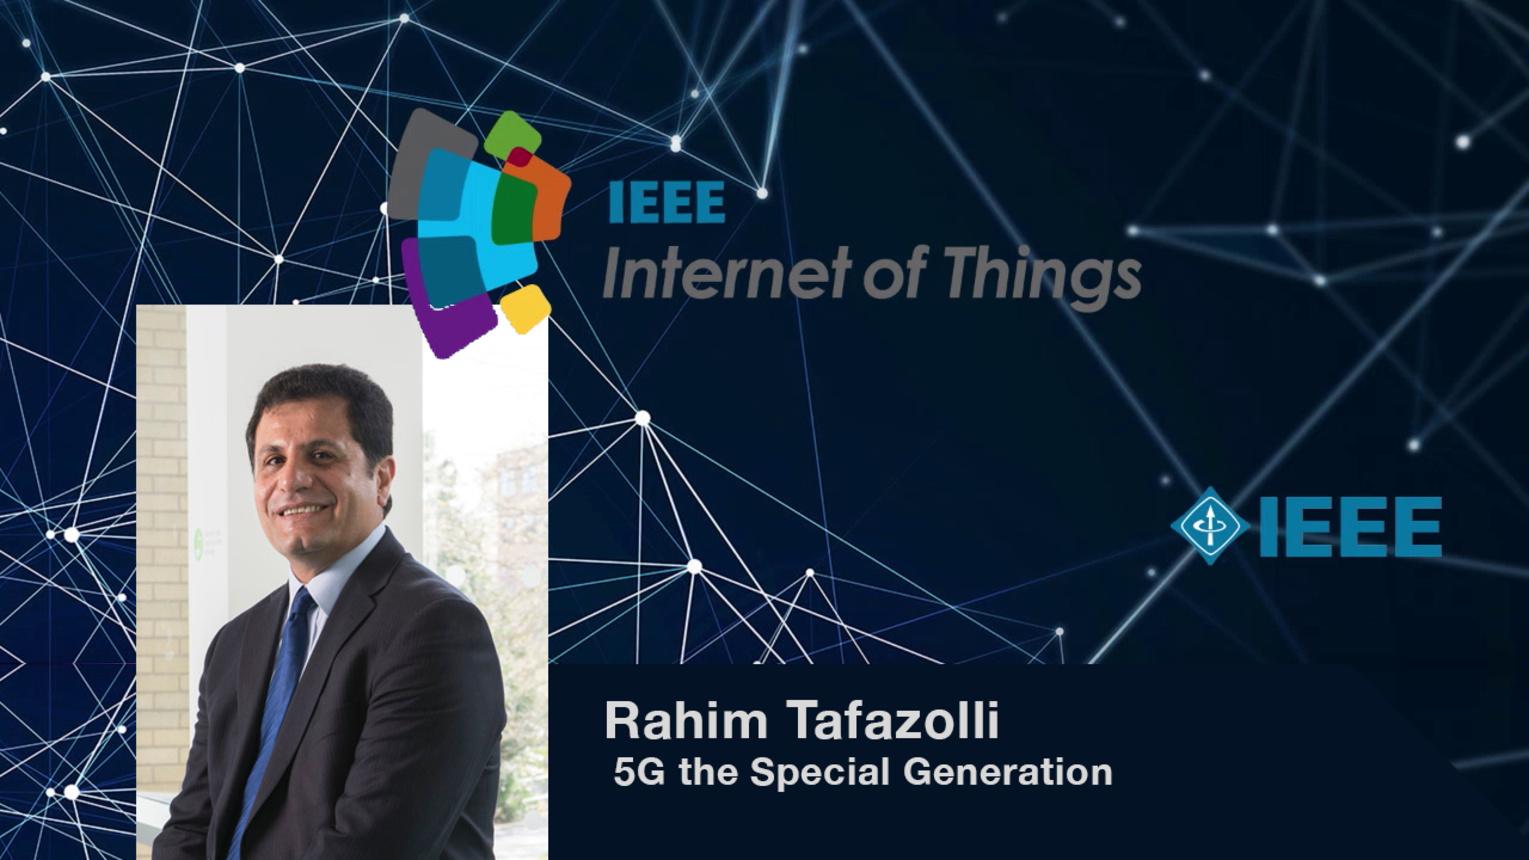 Rahim Tafazolli: 5G the Special Generation - WF-IoT 2015